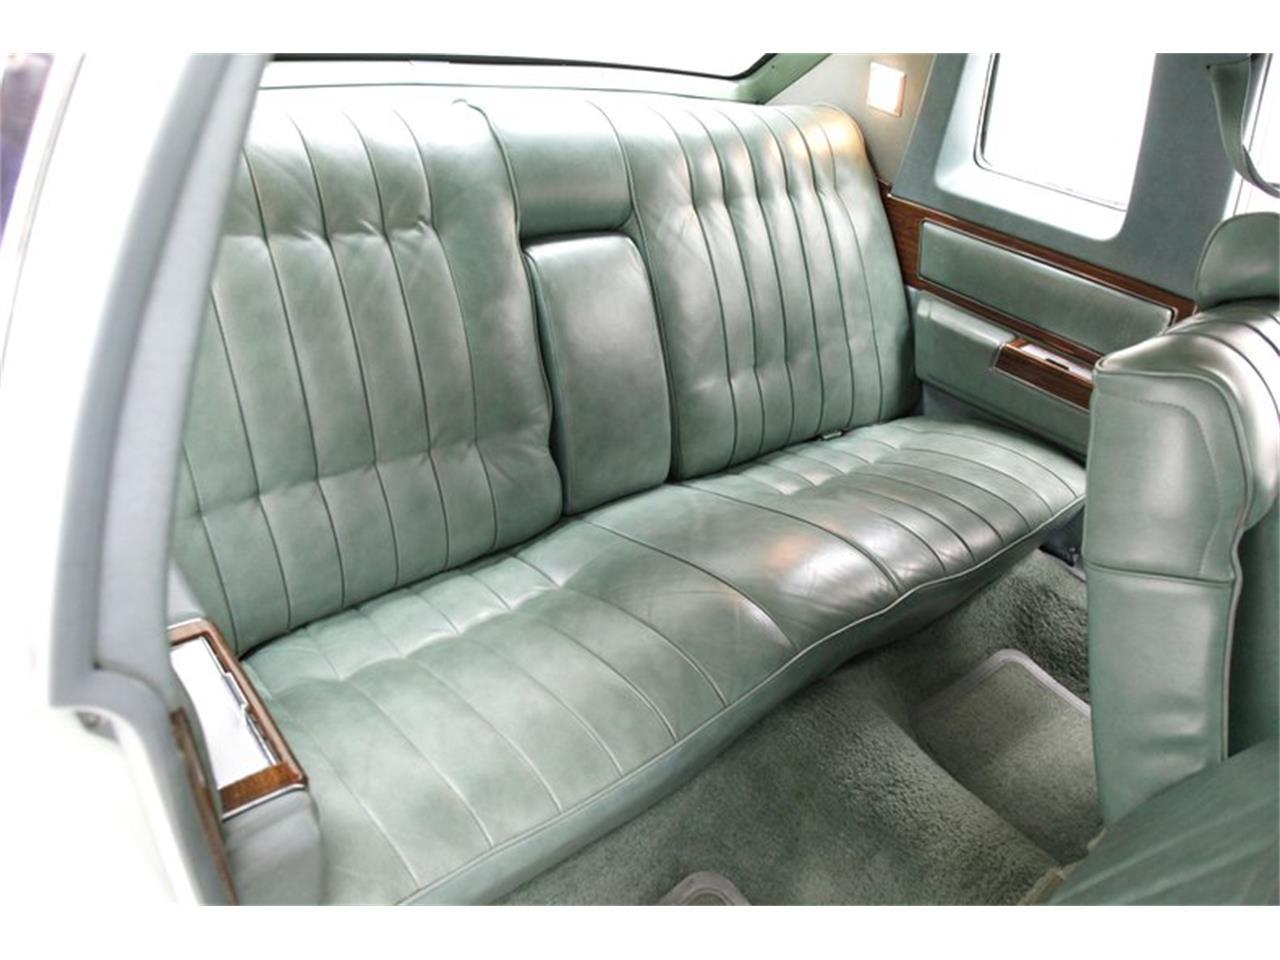 1977 Cadillac Coupe (CC-1390958) for sale in Morgantown, Pennsylvania